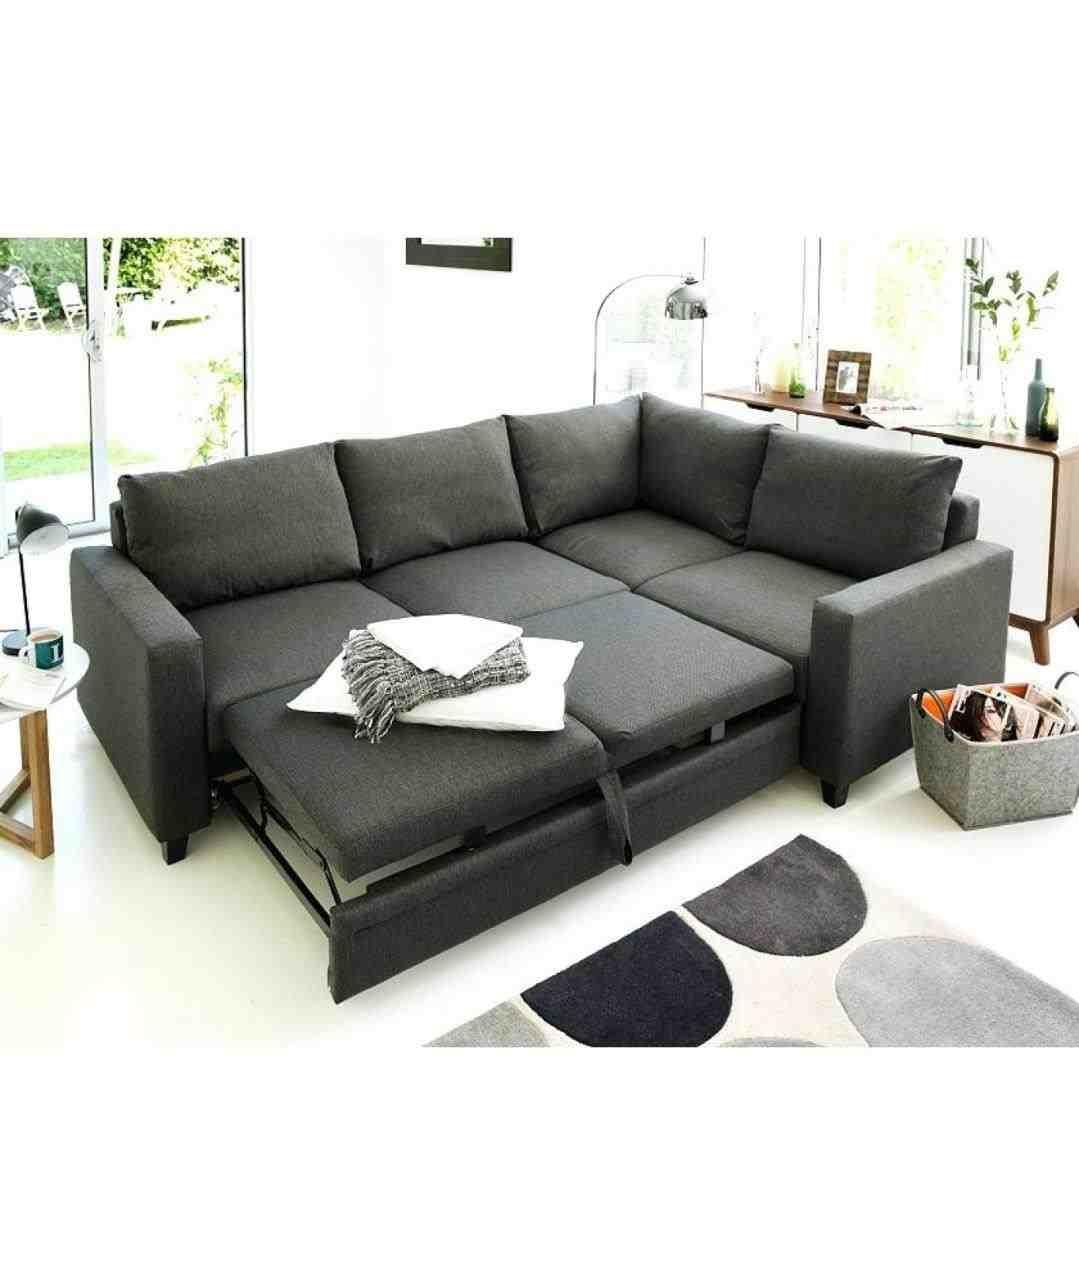 sectional sofas seattle gray nailhead sofa 10 inspirations ideas